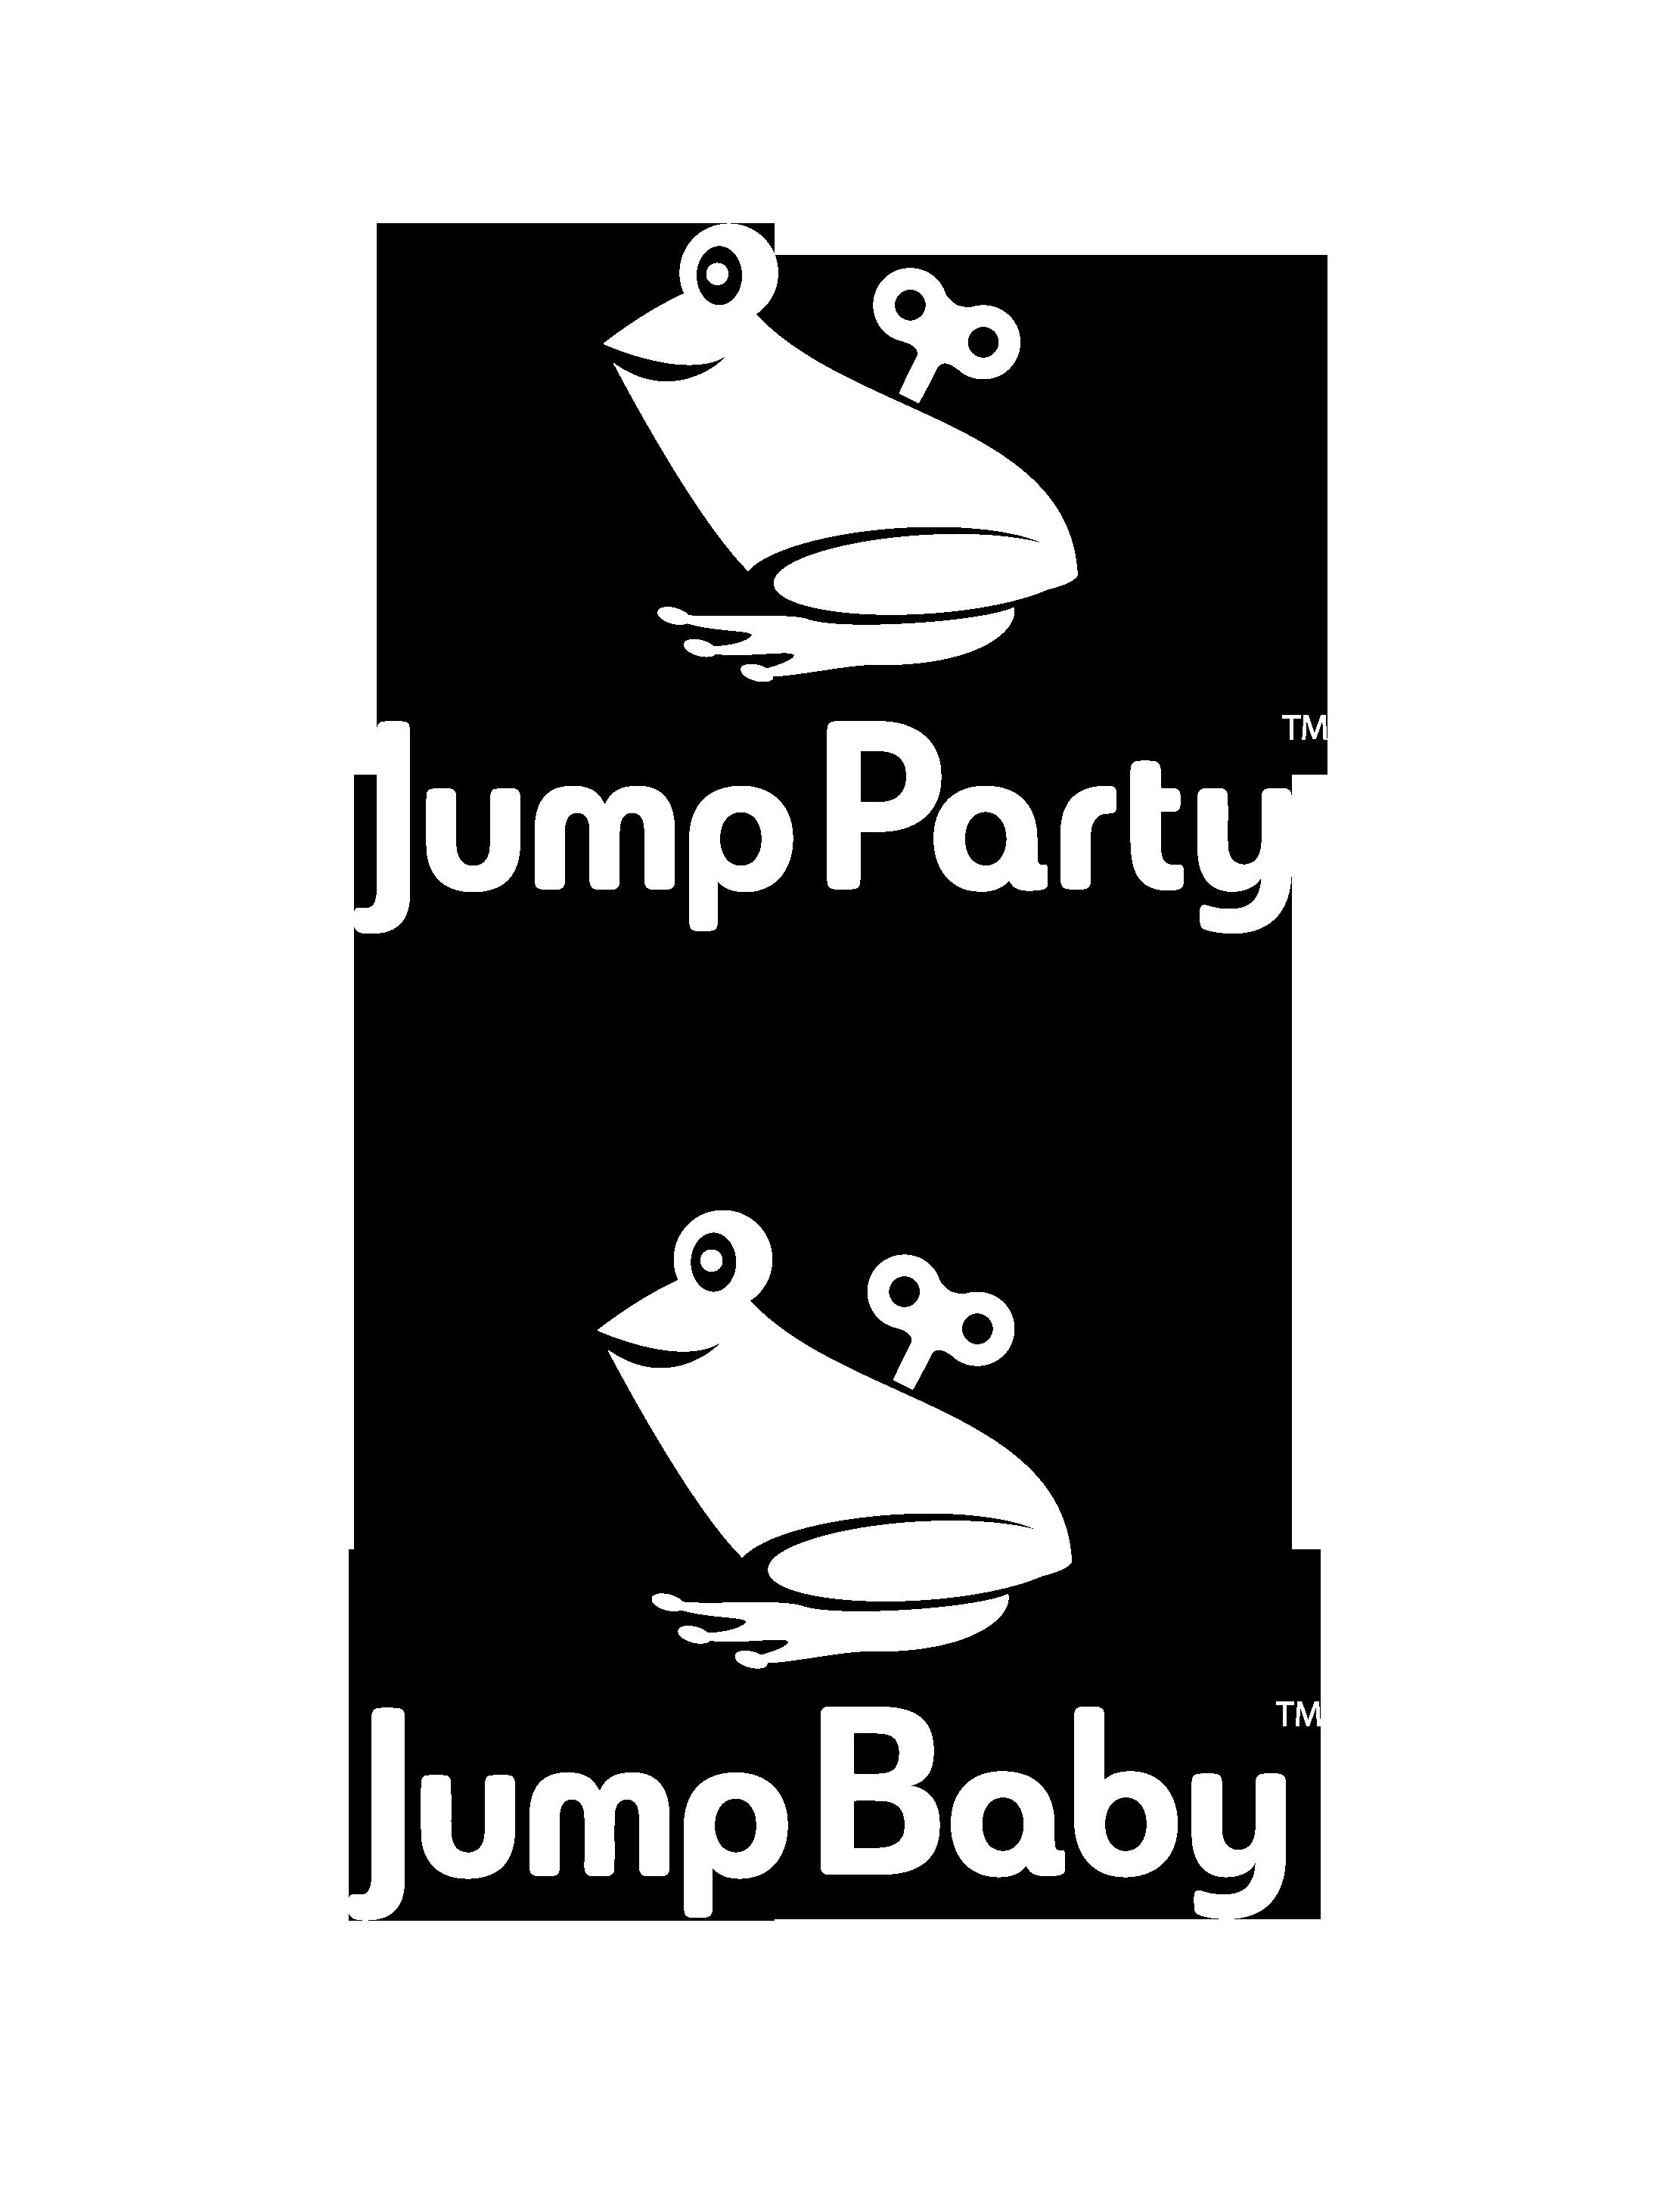 Amendment to Jump Toys logo